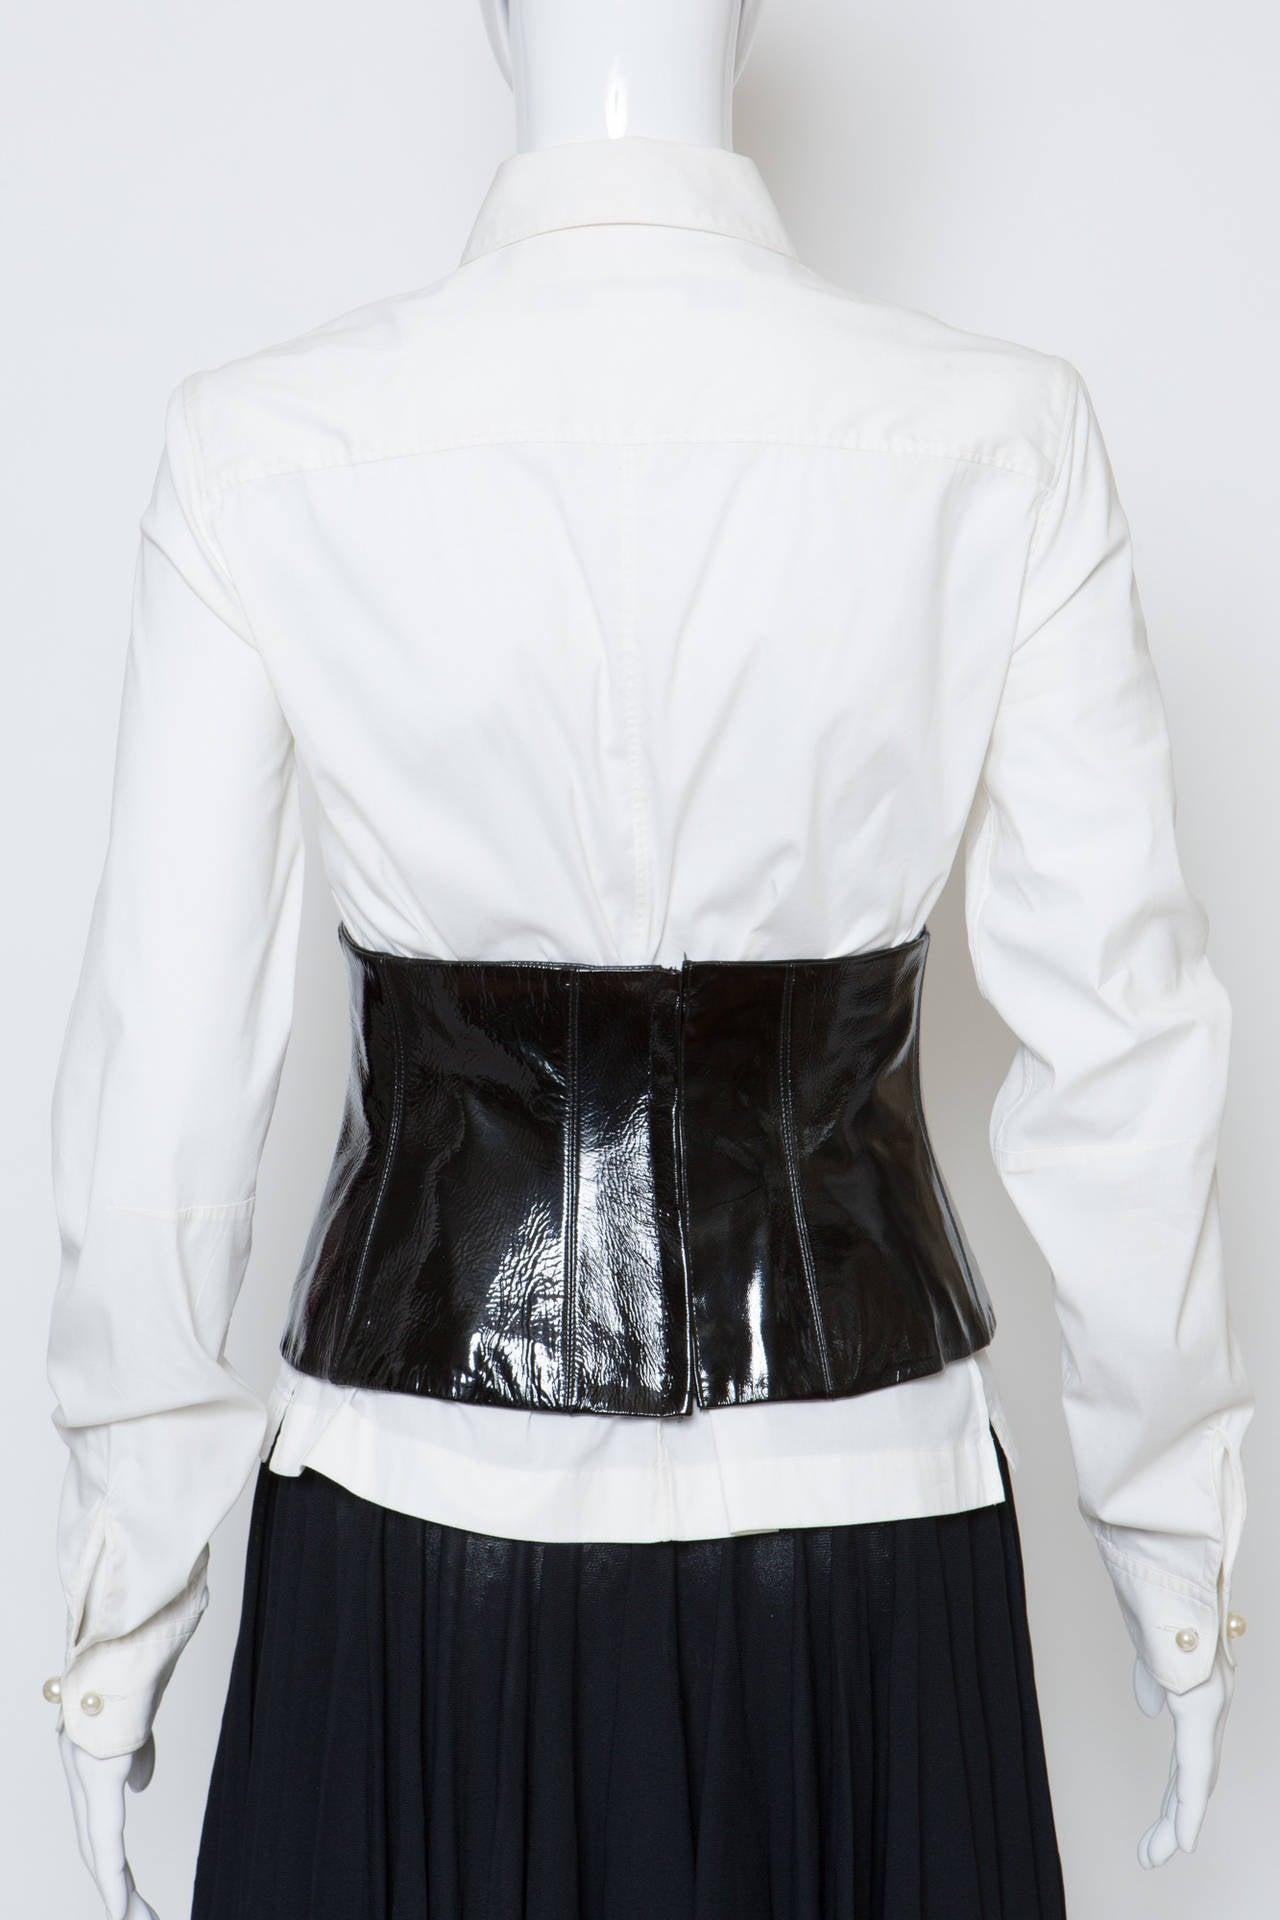 Chanel White Shirt With Black Vinyl Leather Corset Belt 4